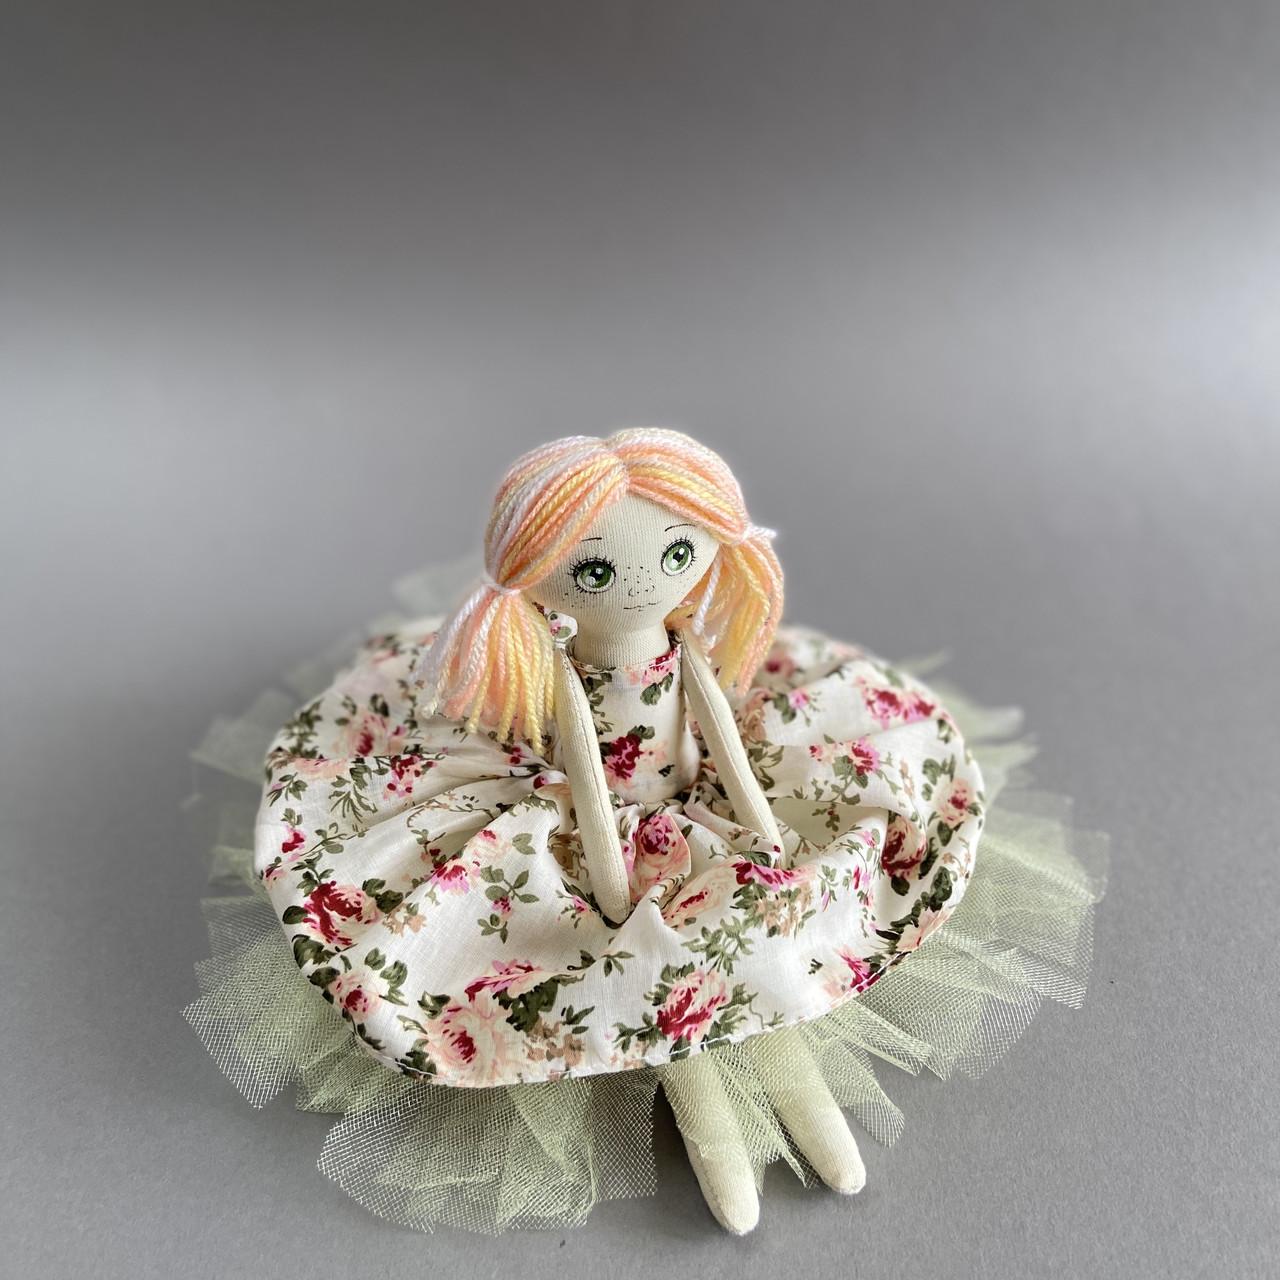 Кукла мягкая игрушка 26 см